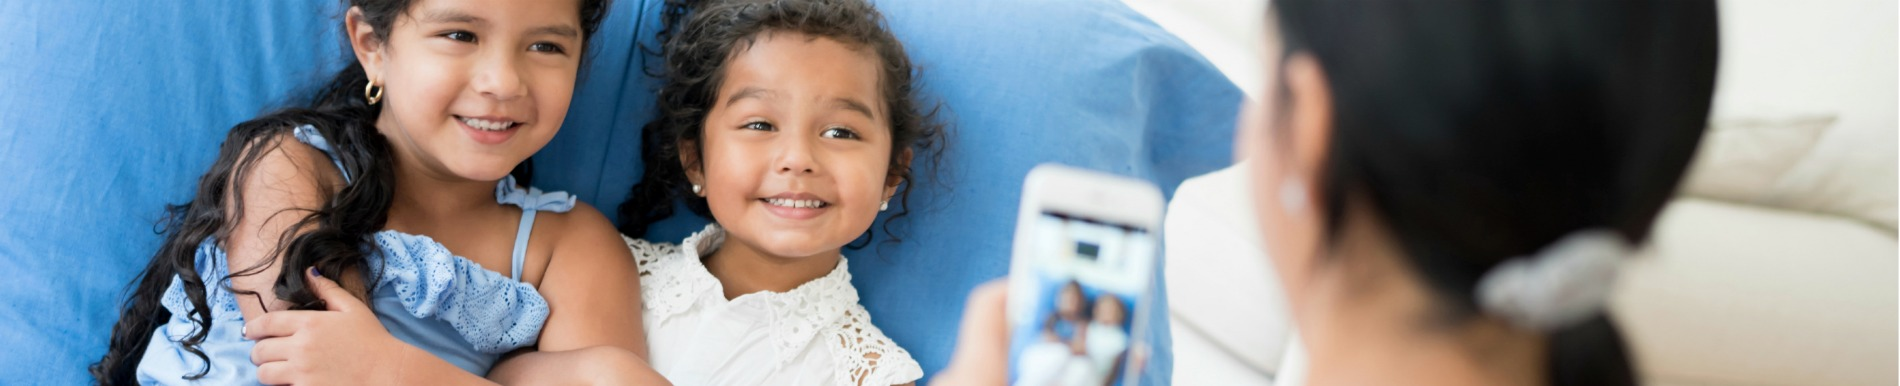 https://www.healthychildren.org/SiteCollectionImage-Homepage-Banners/DonateAPhoto_Banner.jpg